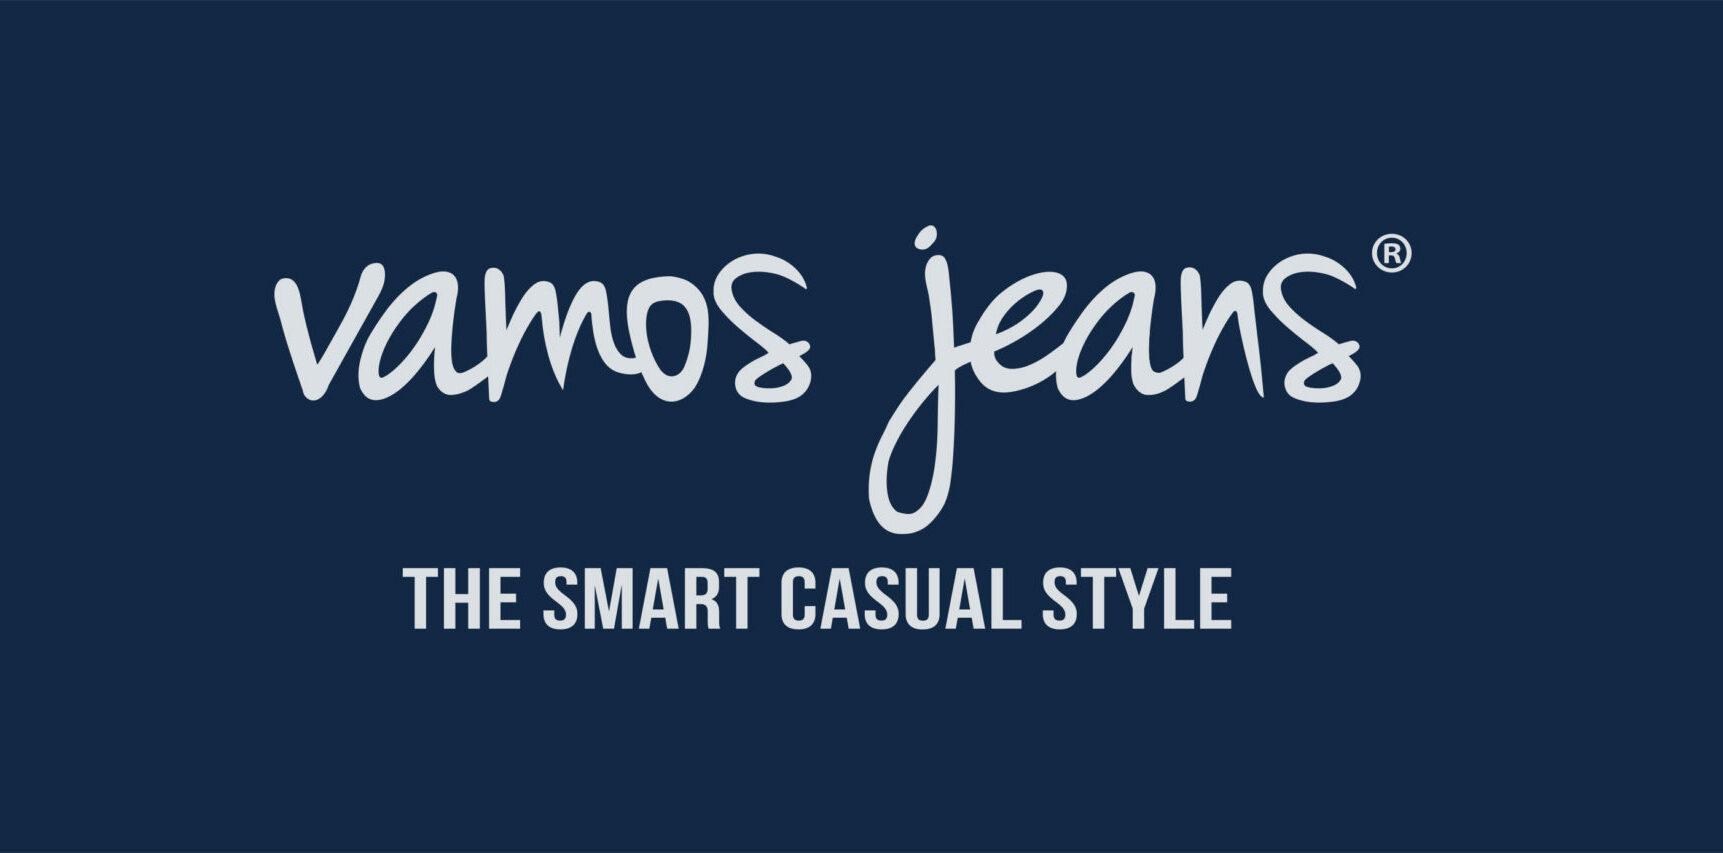 Vamos Jeans